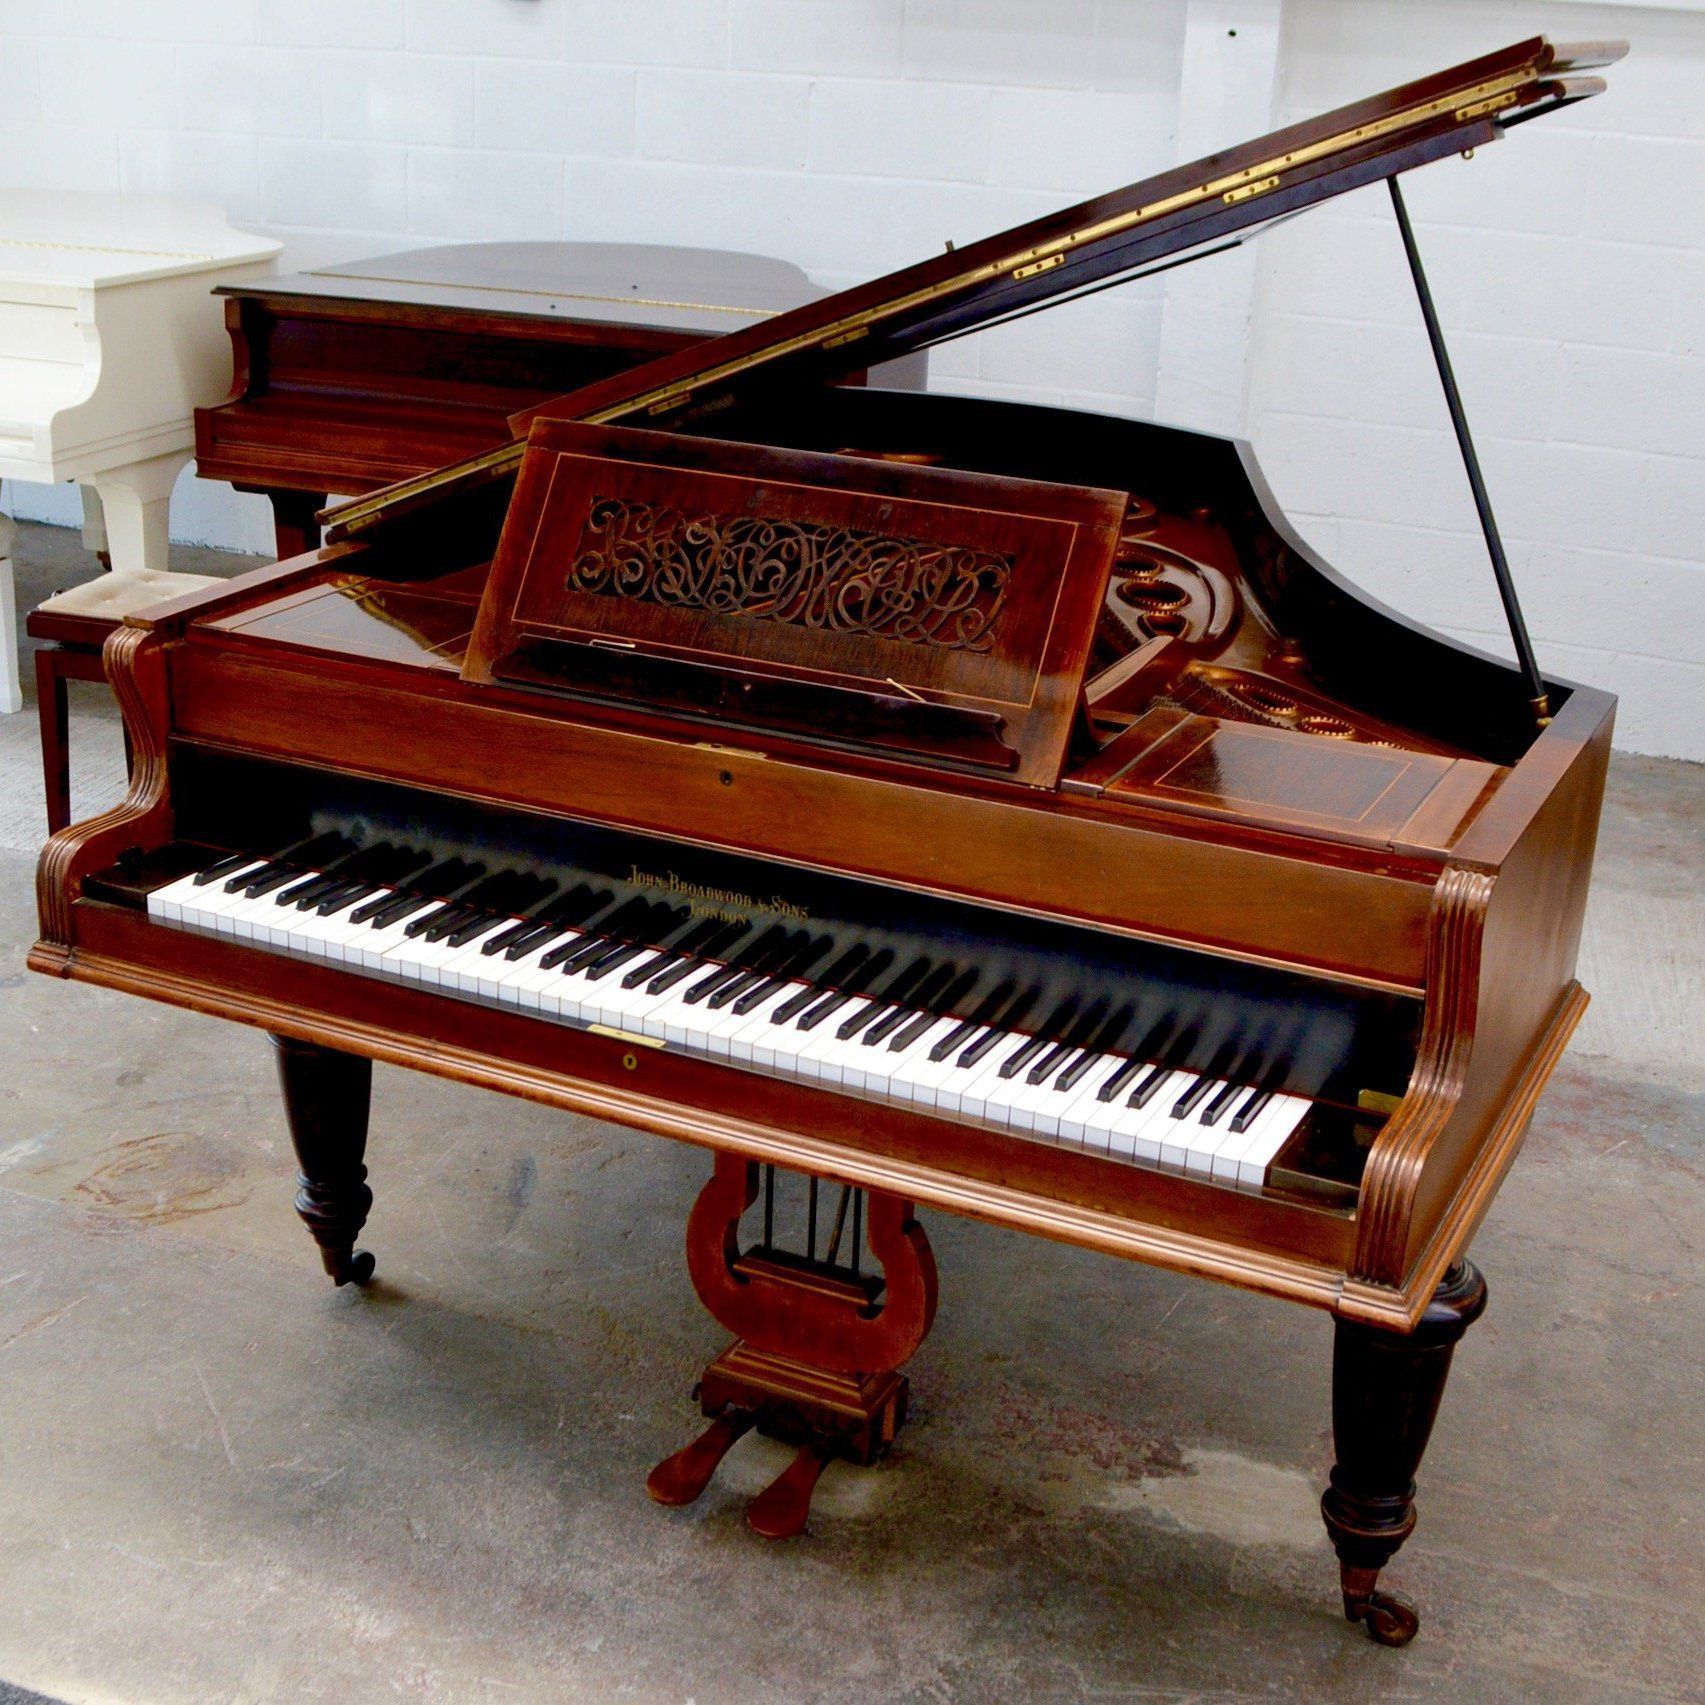 Broadwood Grand Piano Piano Rosewood Used Piano